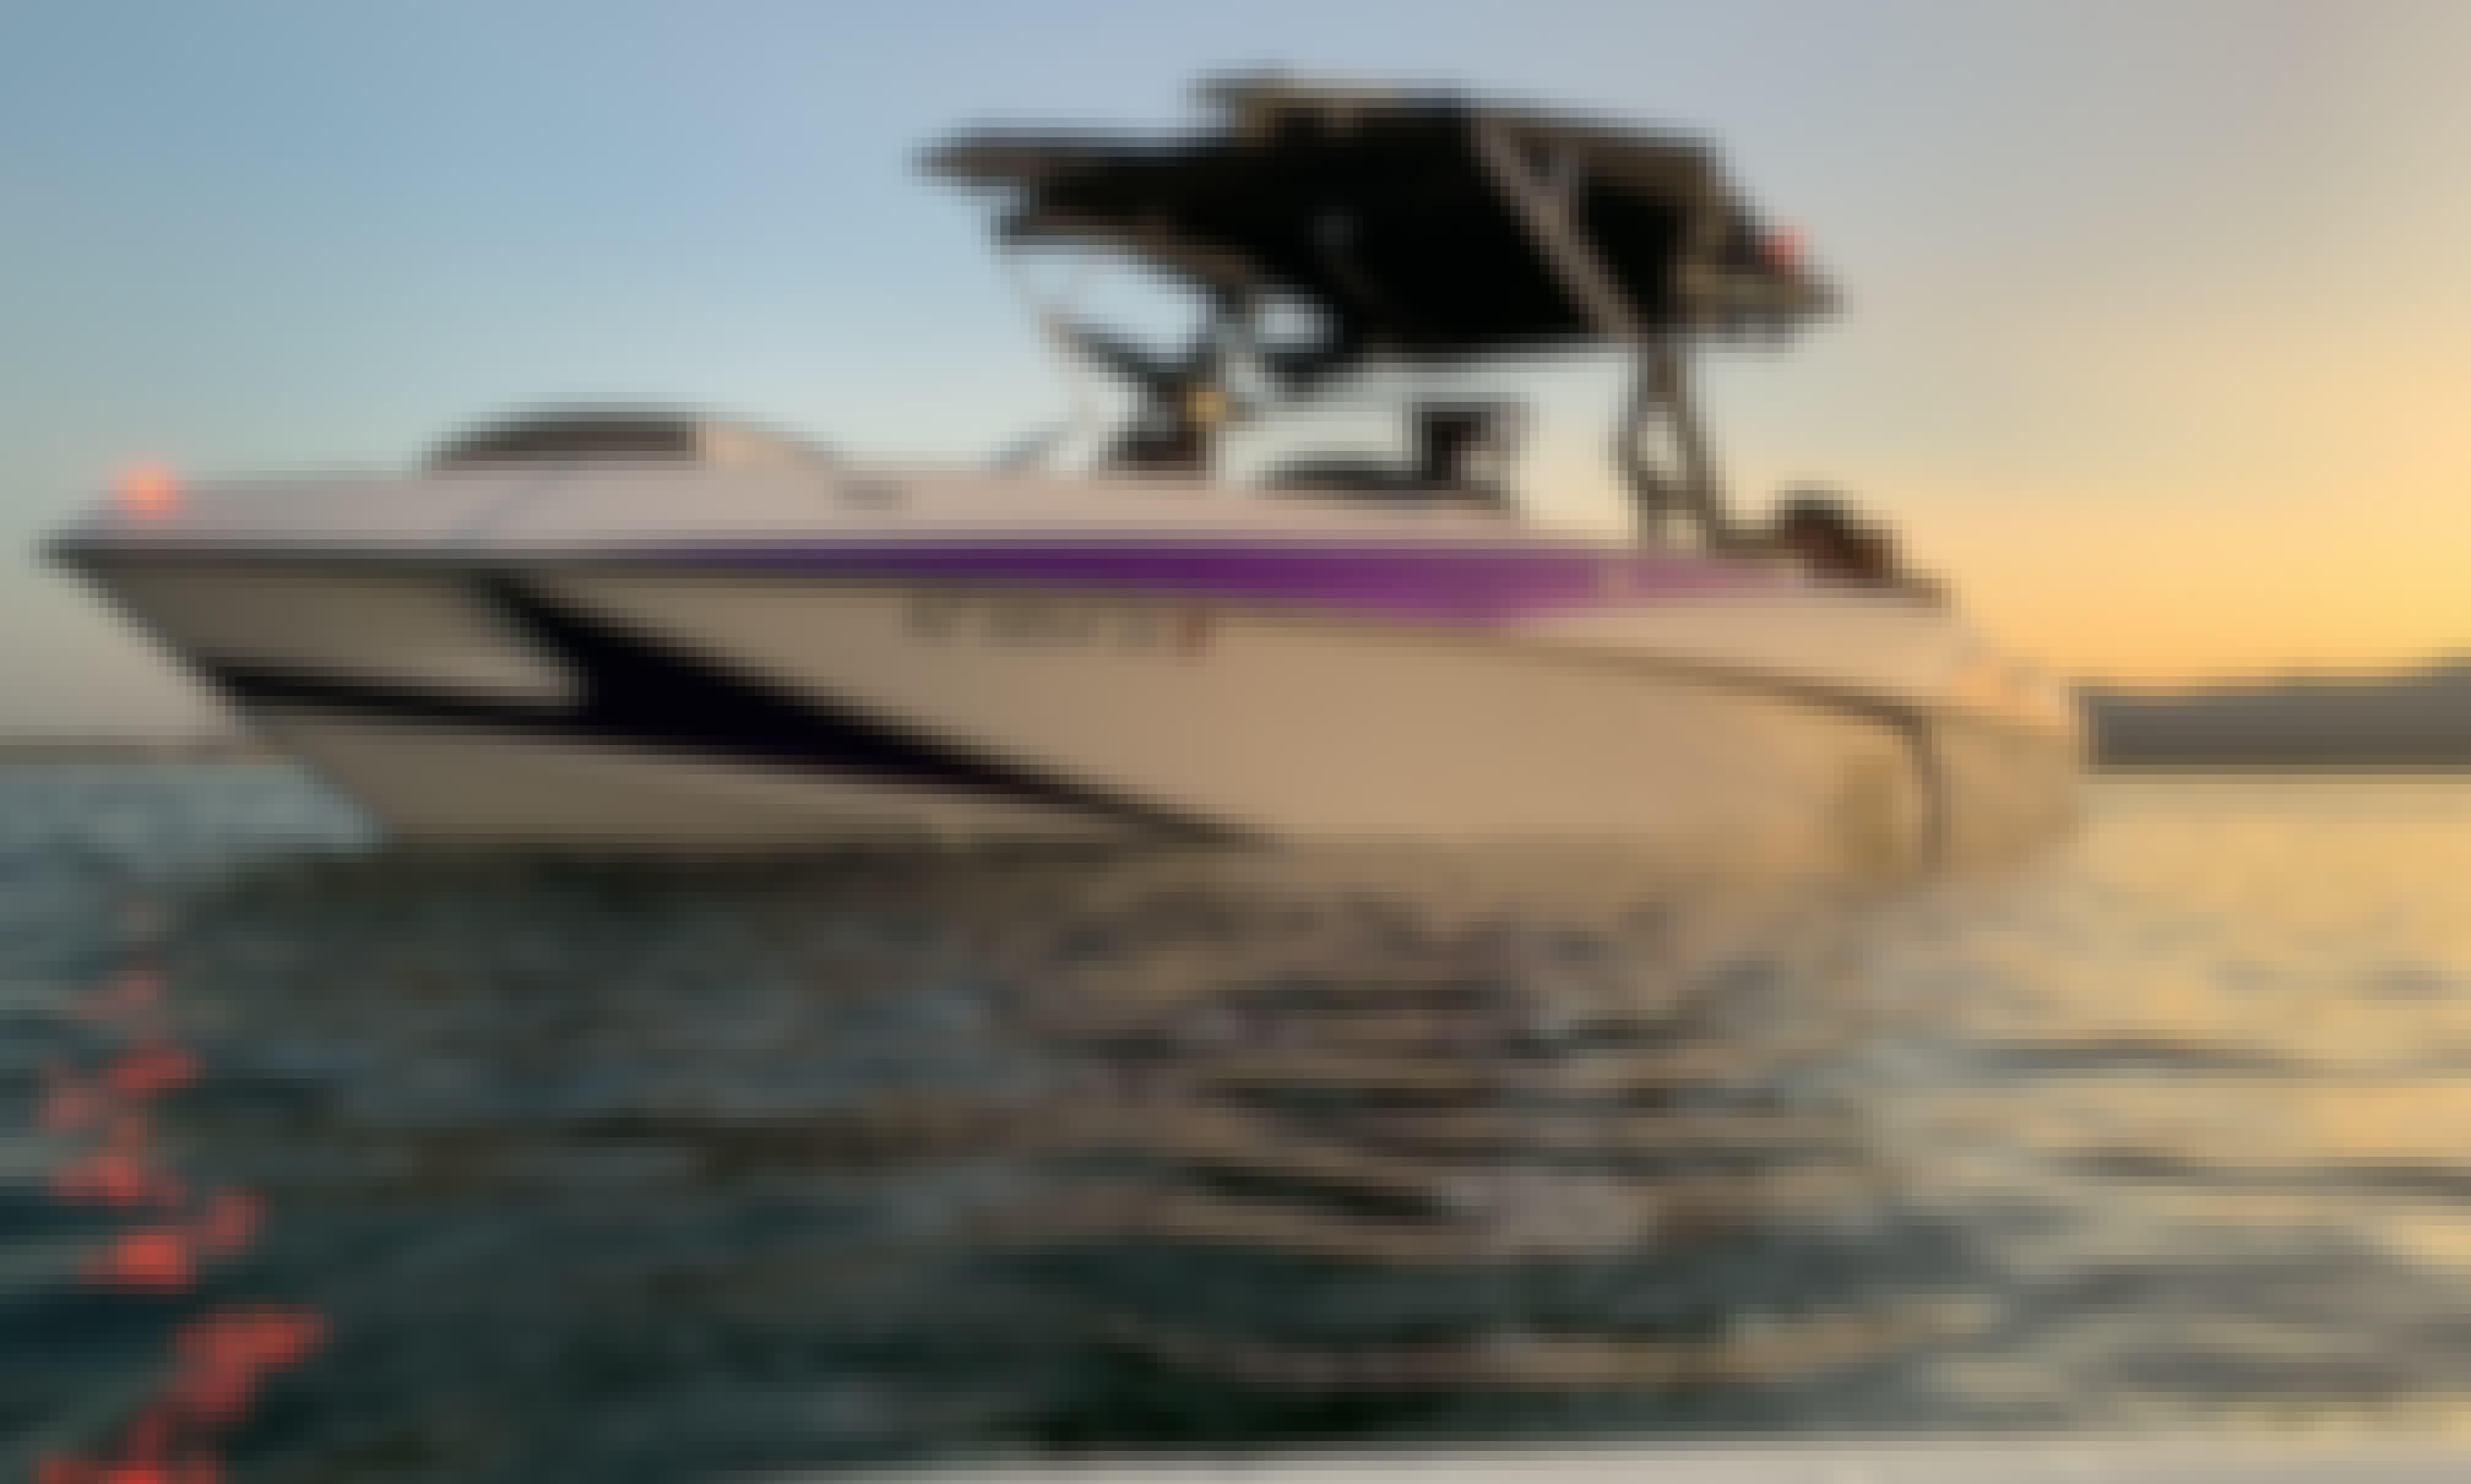 Axis T23 Wakeboard Boat in Lake Havasu City